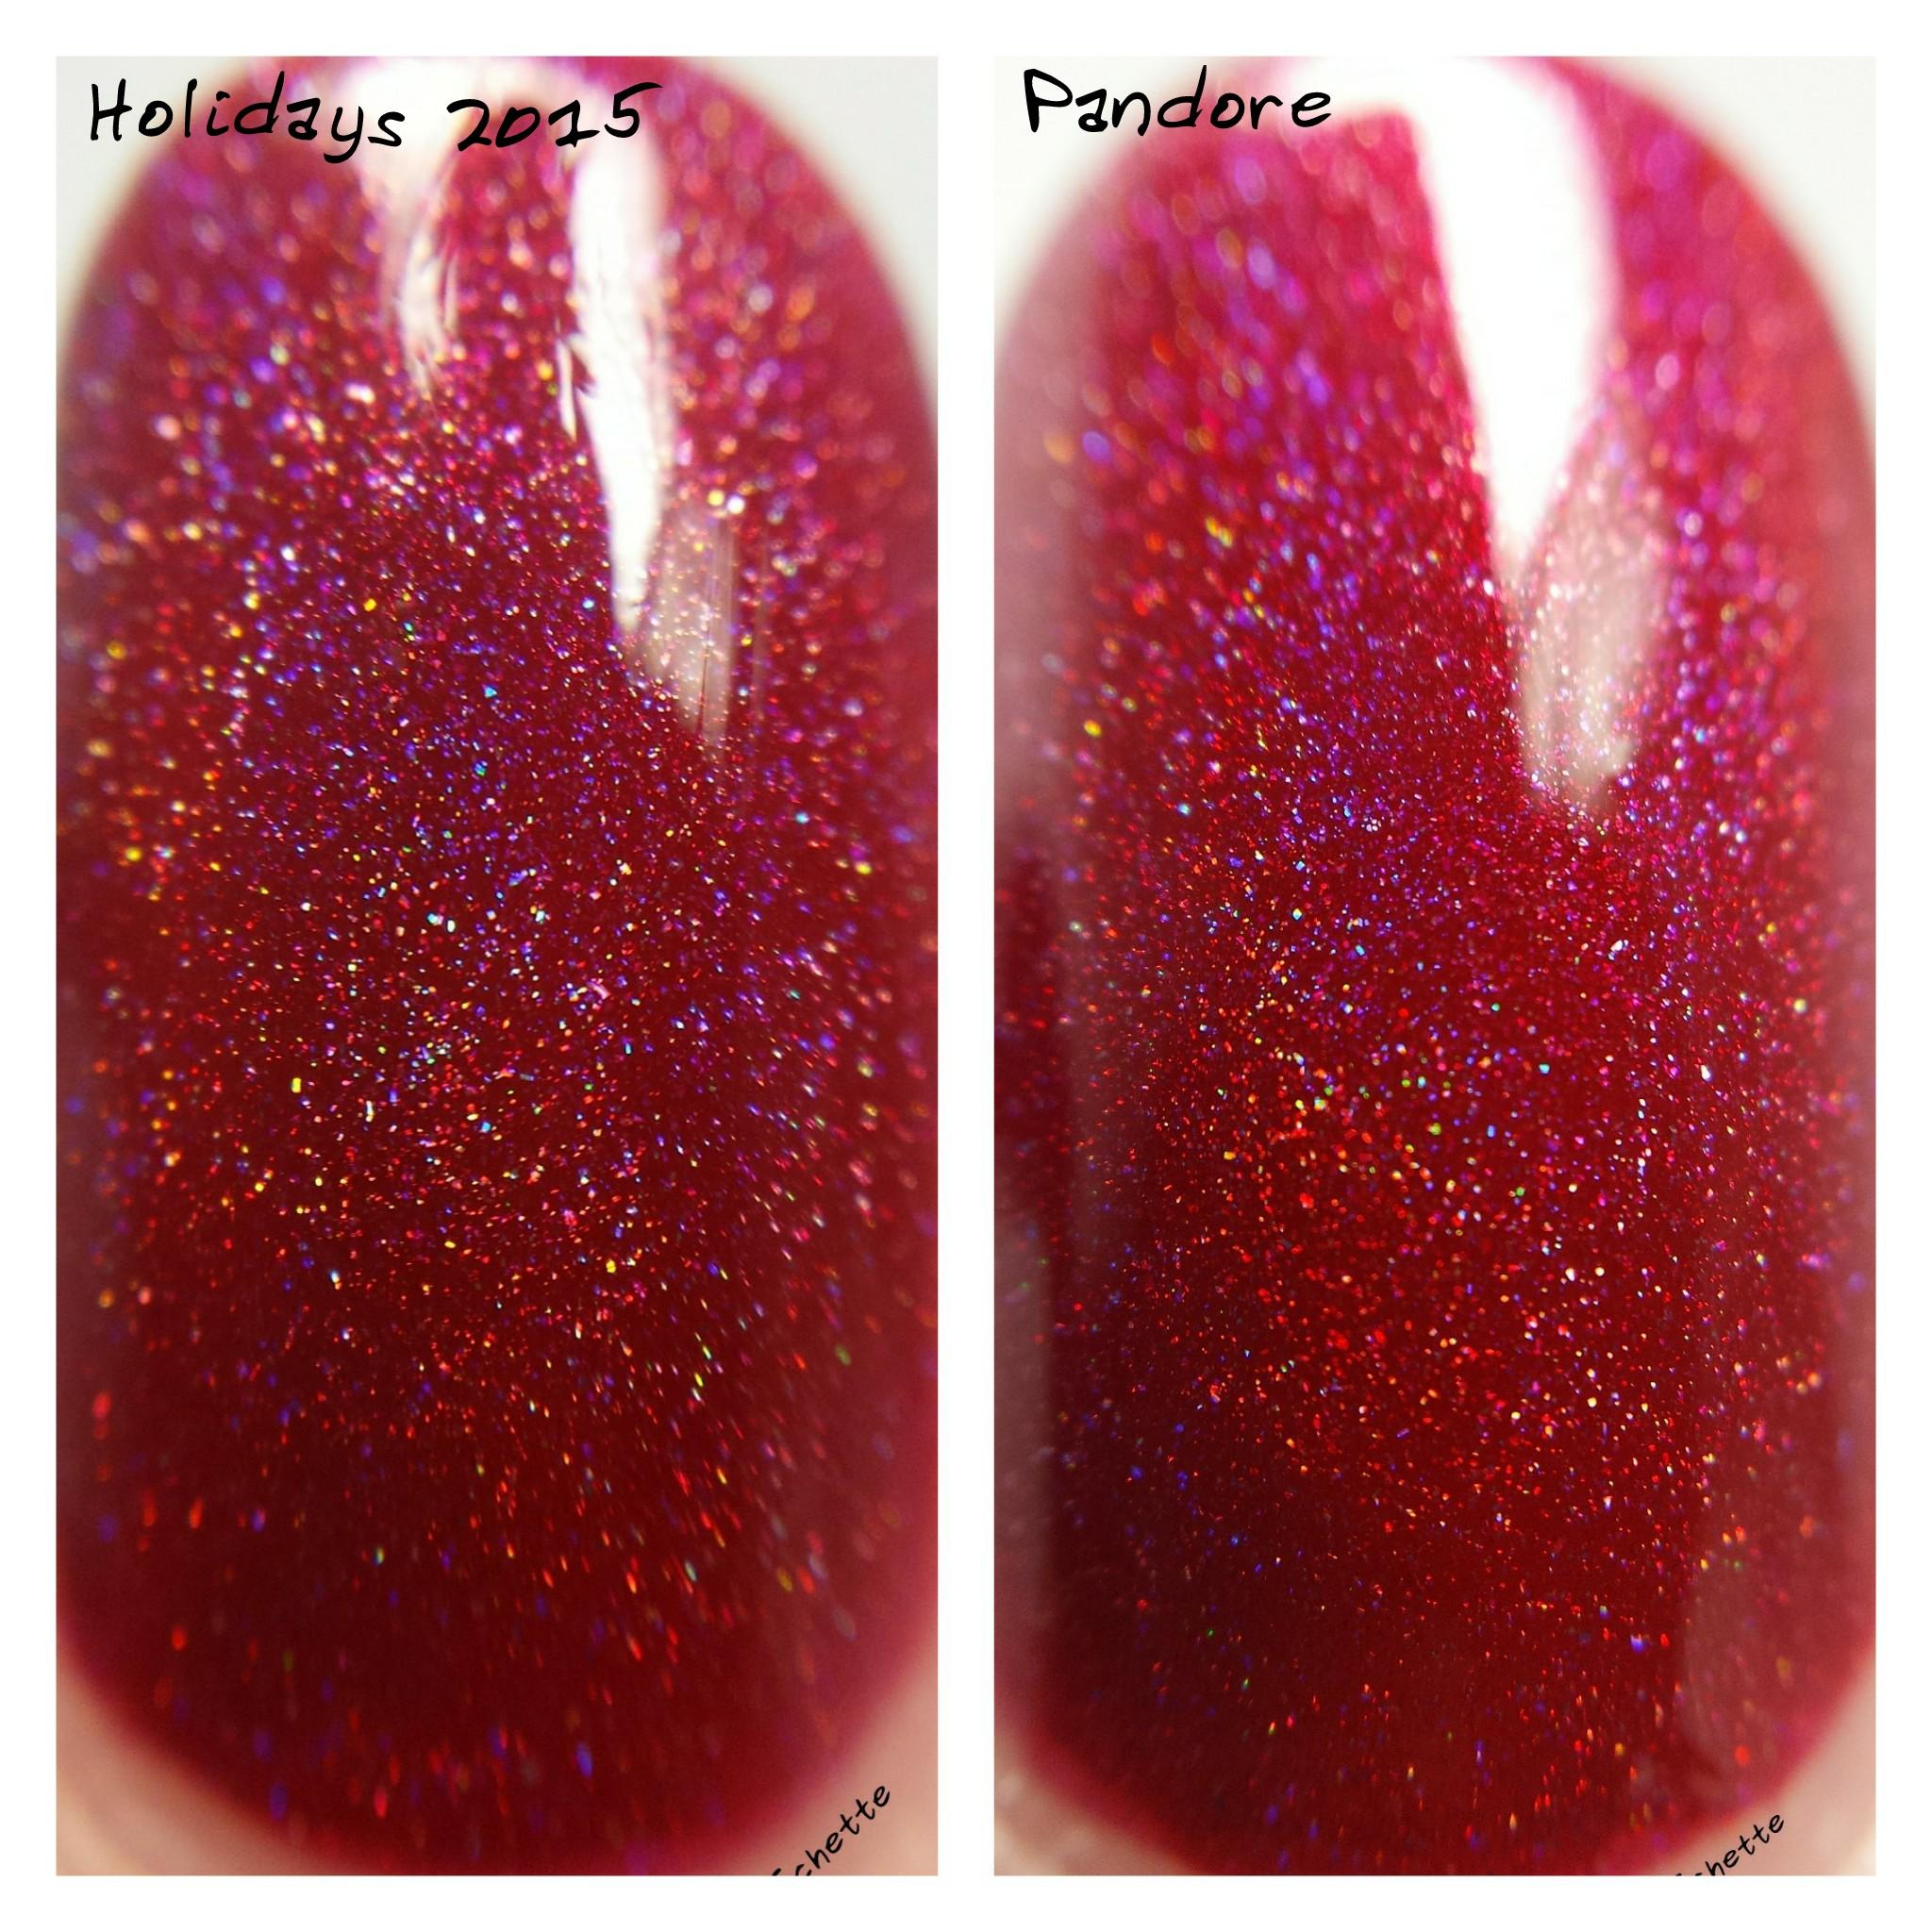 Enchanted Polish : Comparison Pandore Holidays 2015